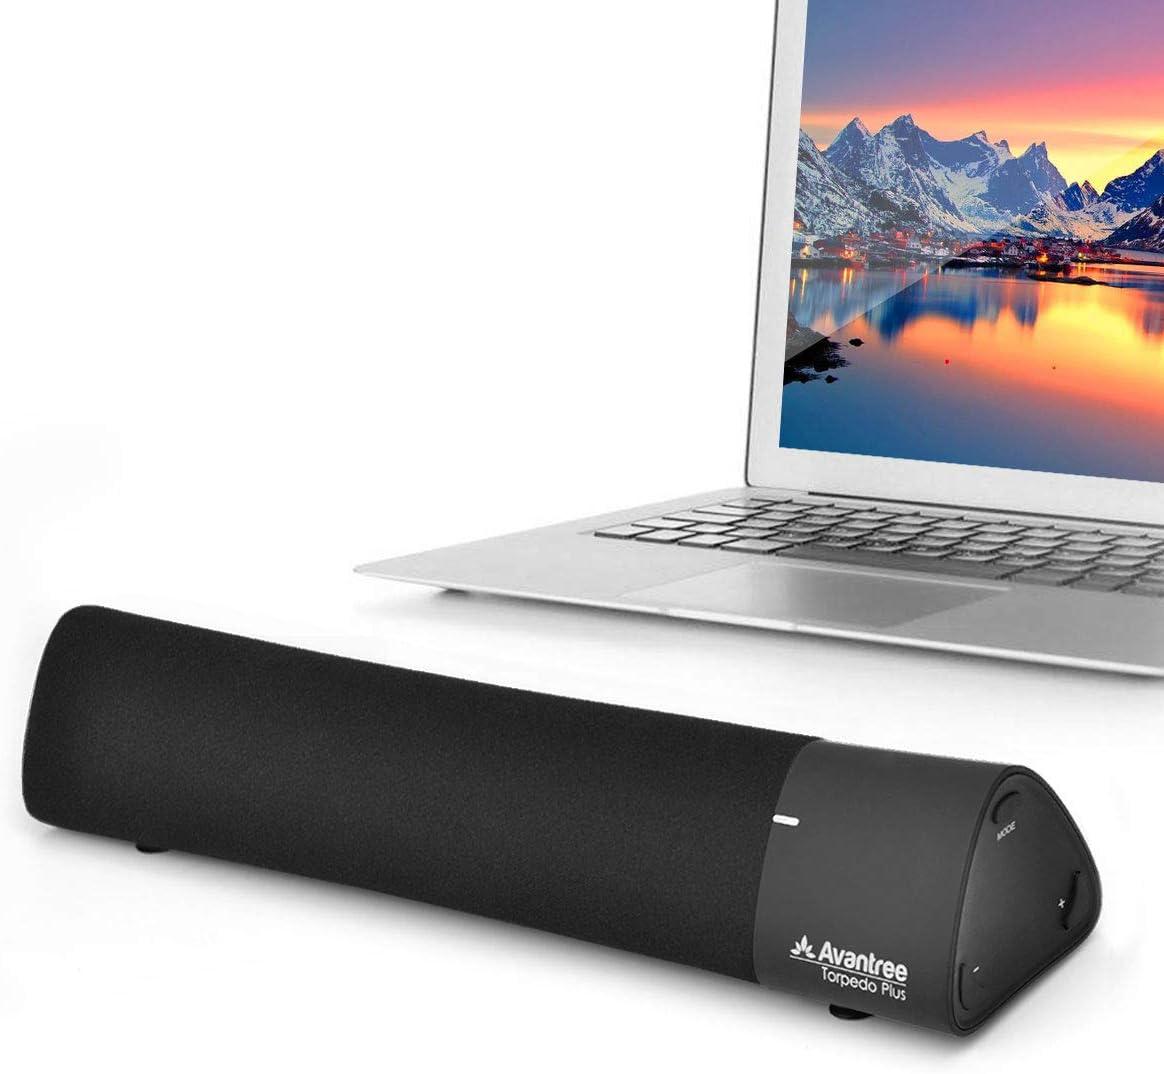 Avantree Torpedo Plus Aptx Low Latency Tragbarer Lautsprecher Für Laptop Macbook Pc Desktop Tablets Dsp Mit Surround Sound Bluetooth Wireless Lautsprecher Super Bass Mini Tv Soundbar Audio Hifi